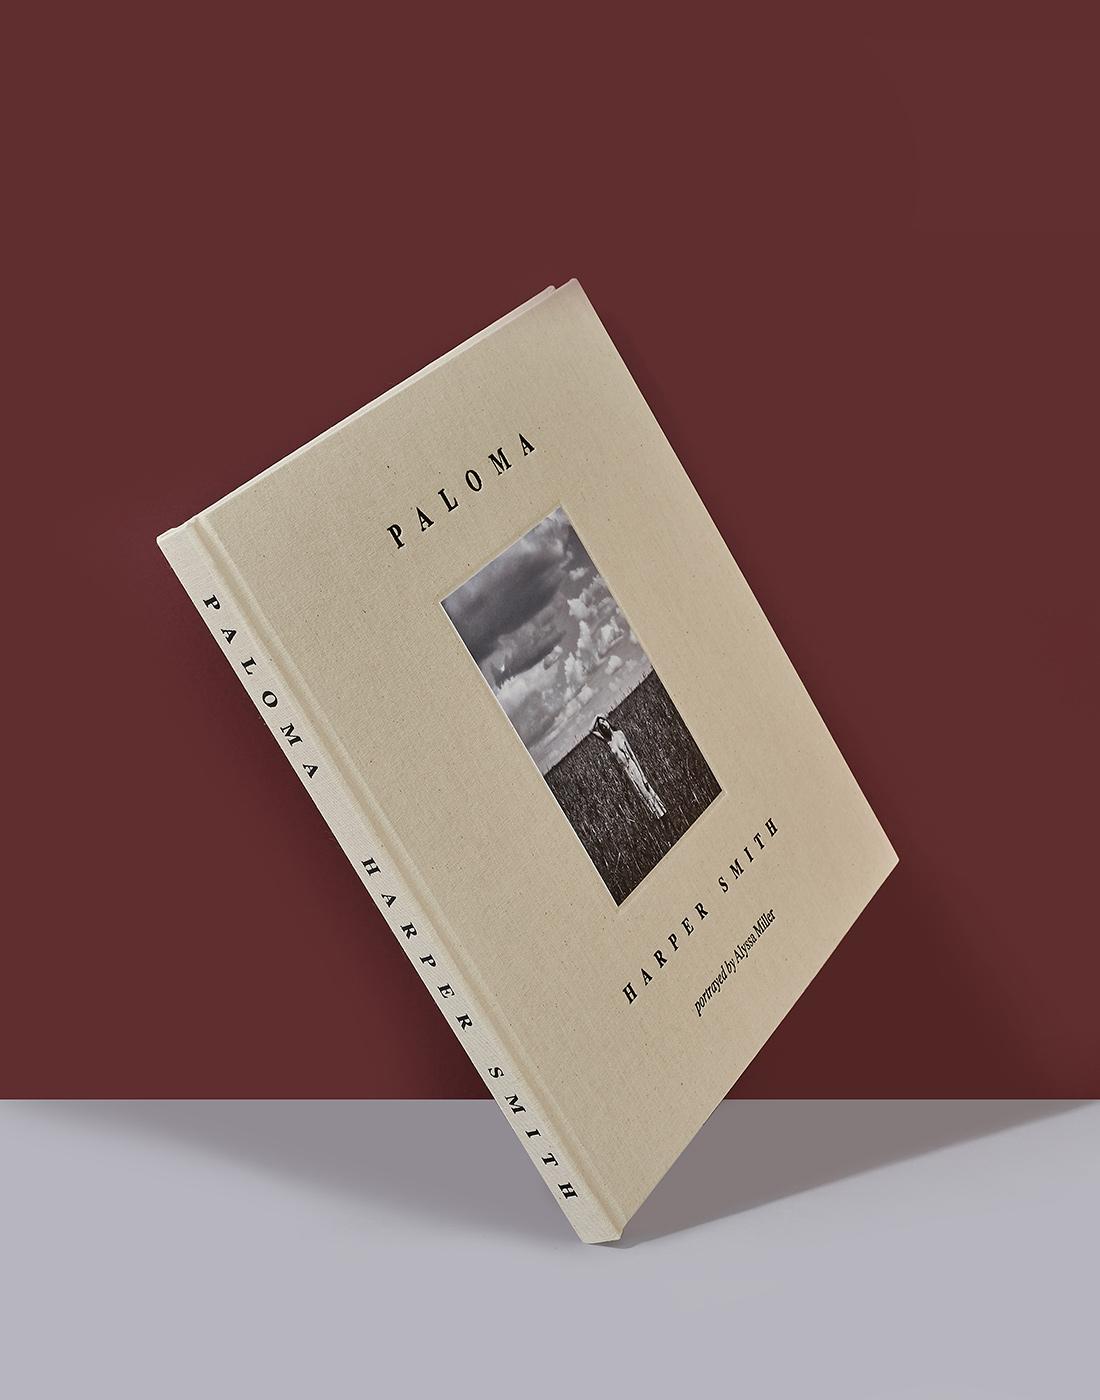 PALOMA, by Harper Smith